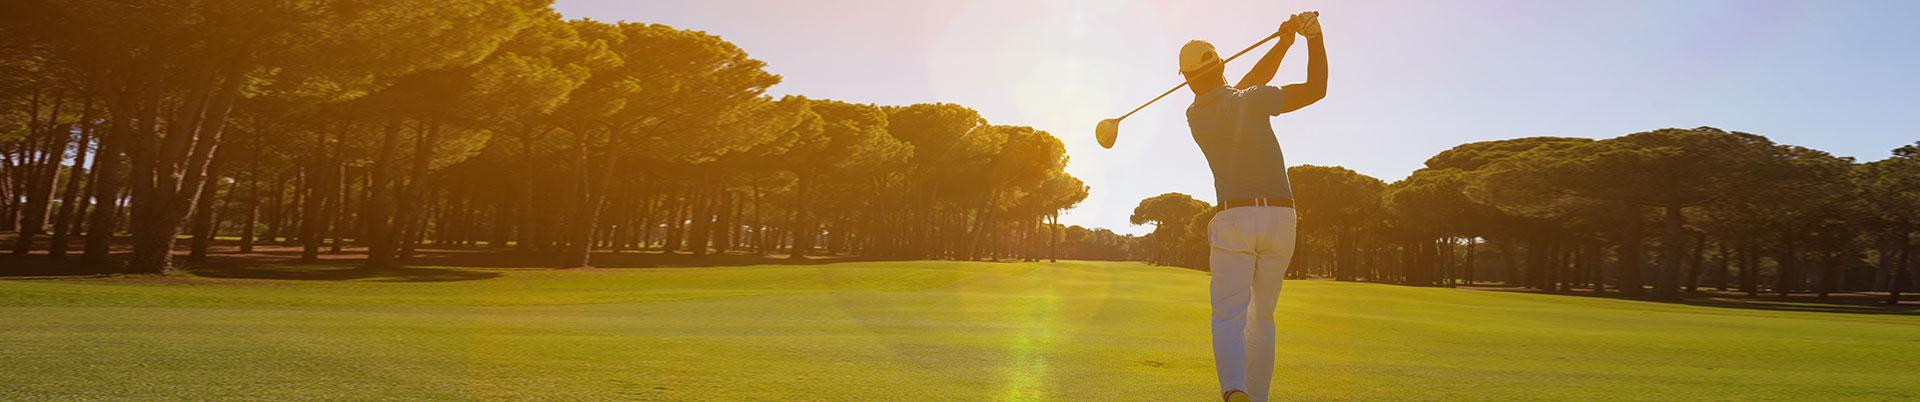 Golf Course Management Software